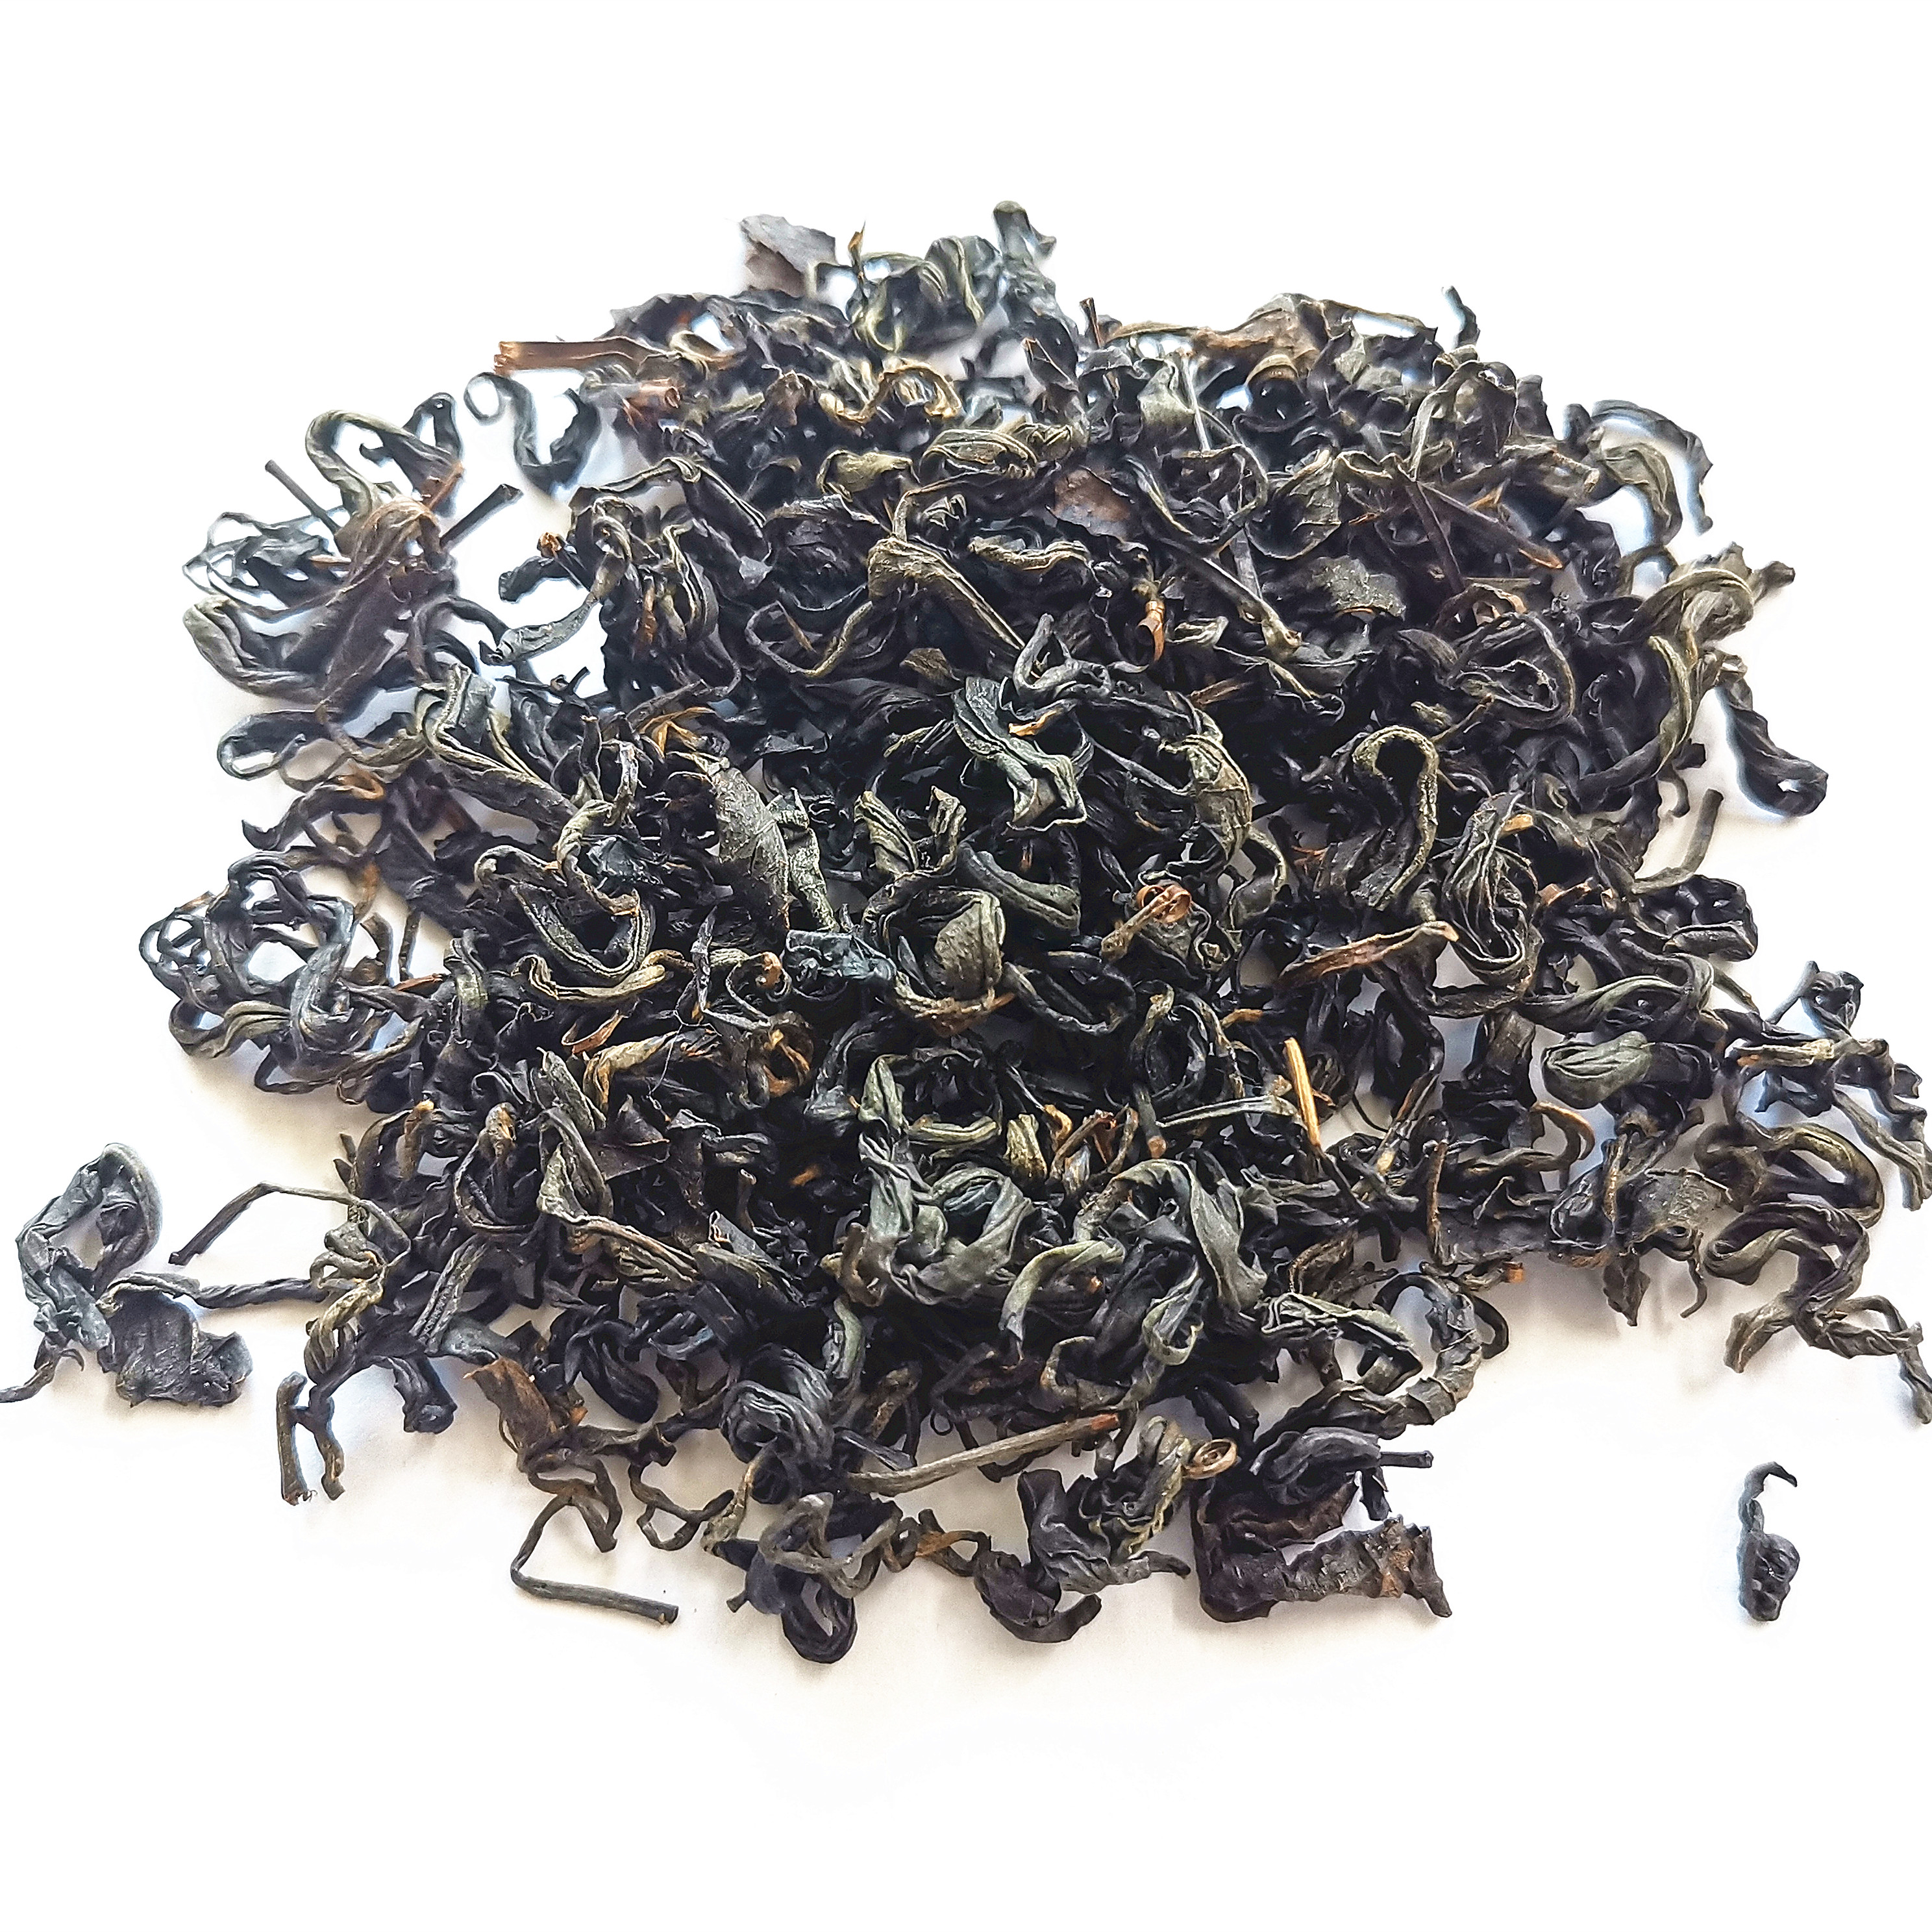 A-Top quality chinese organic tea, natural slimming black tea - 4uTea   4uTea.com